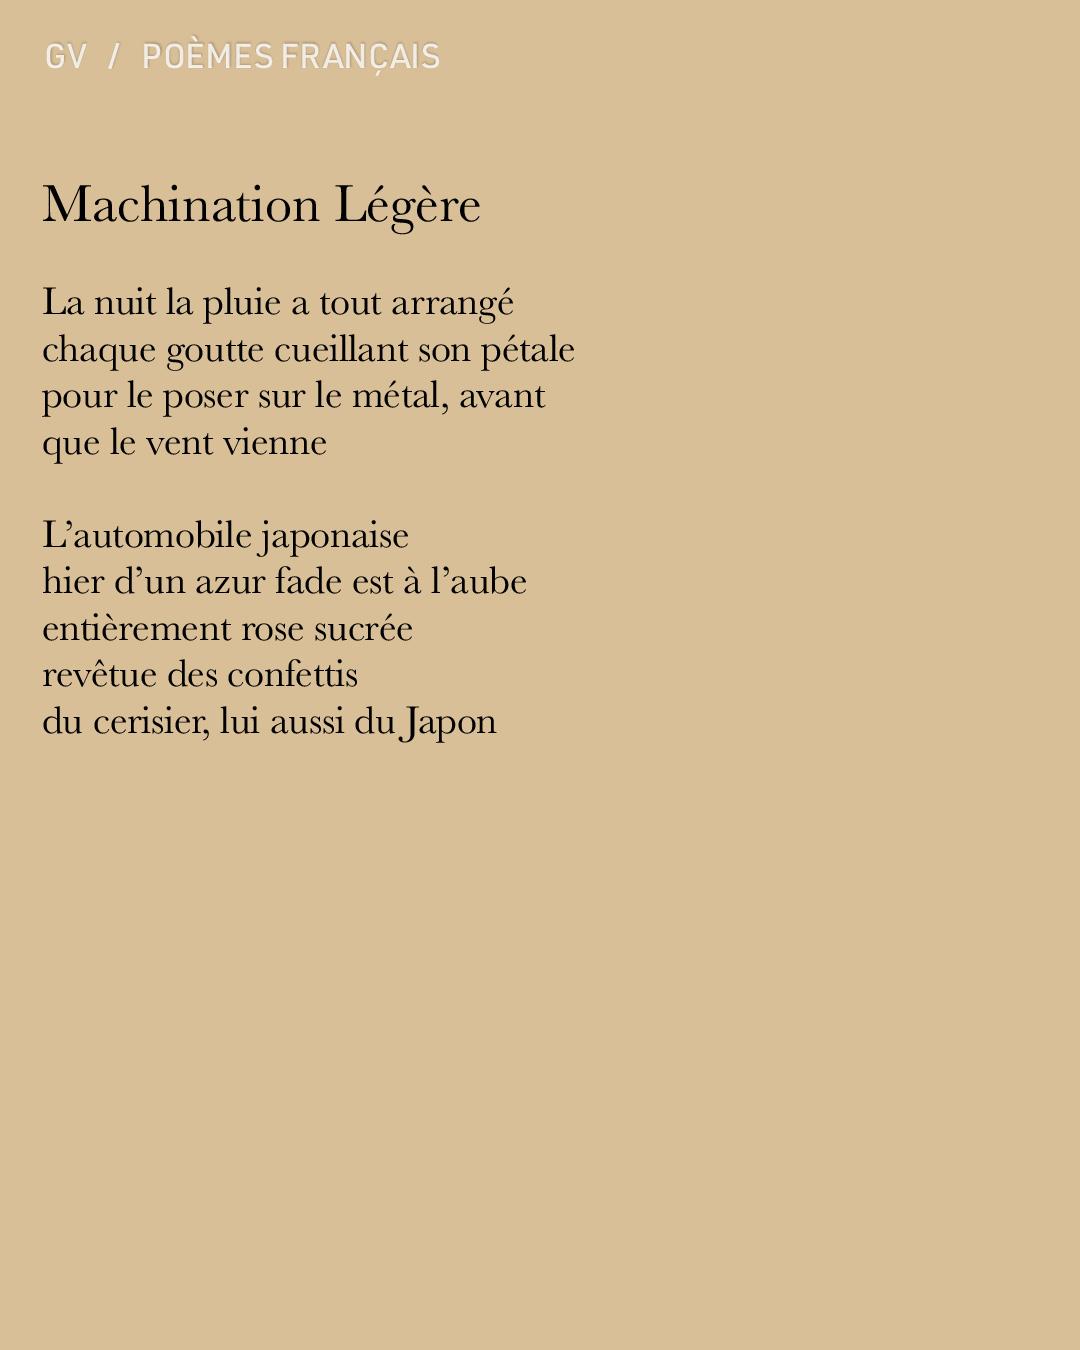 Gvion-PoemesF-Machination.jpg